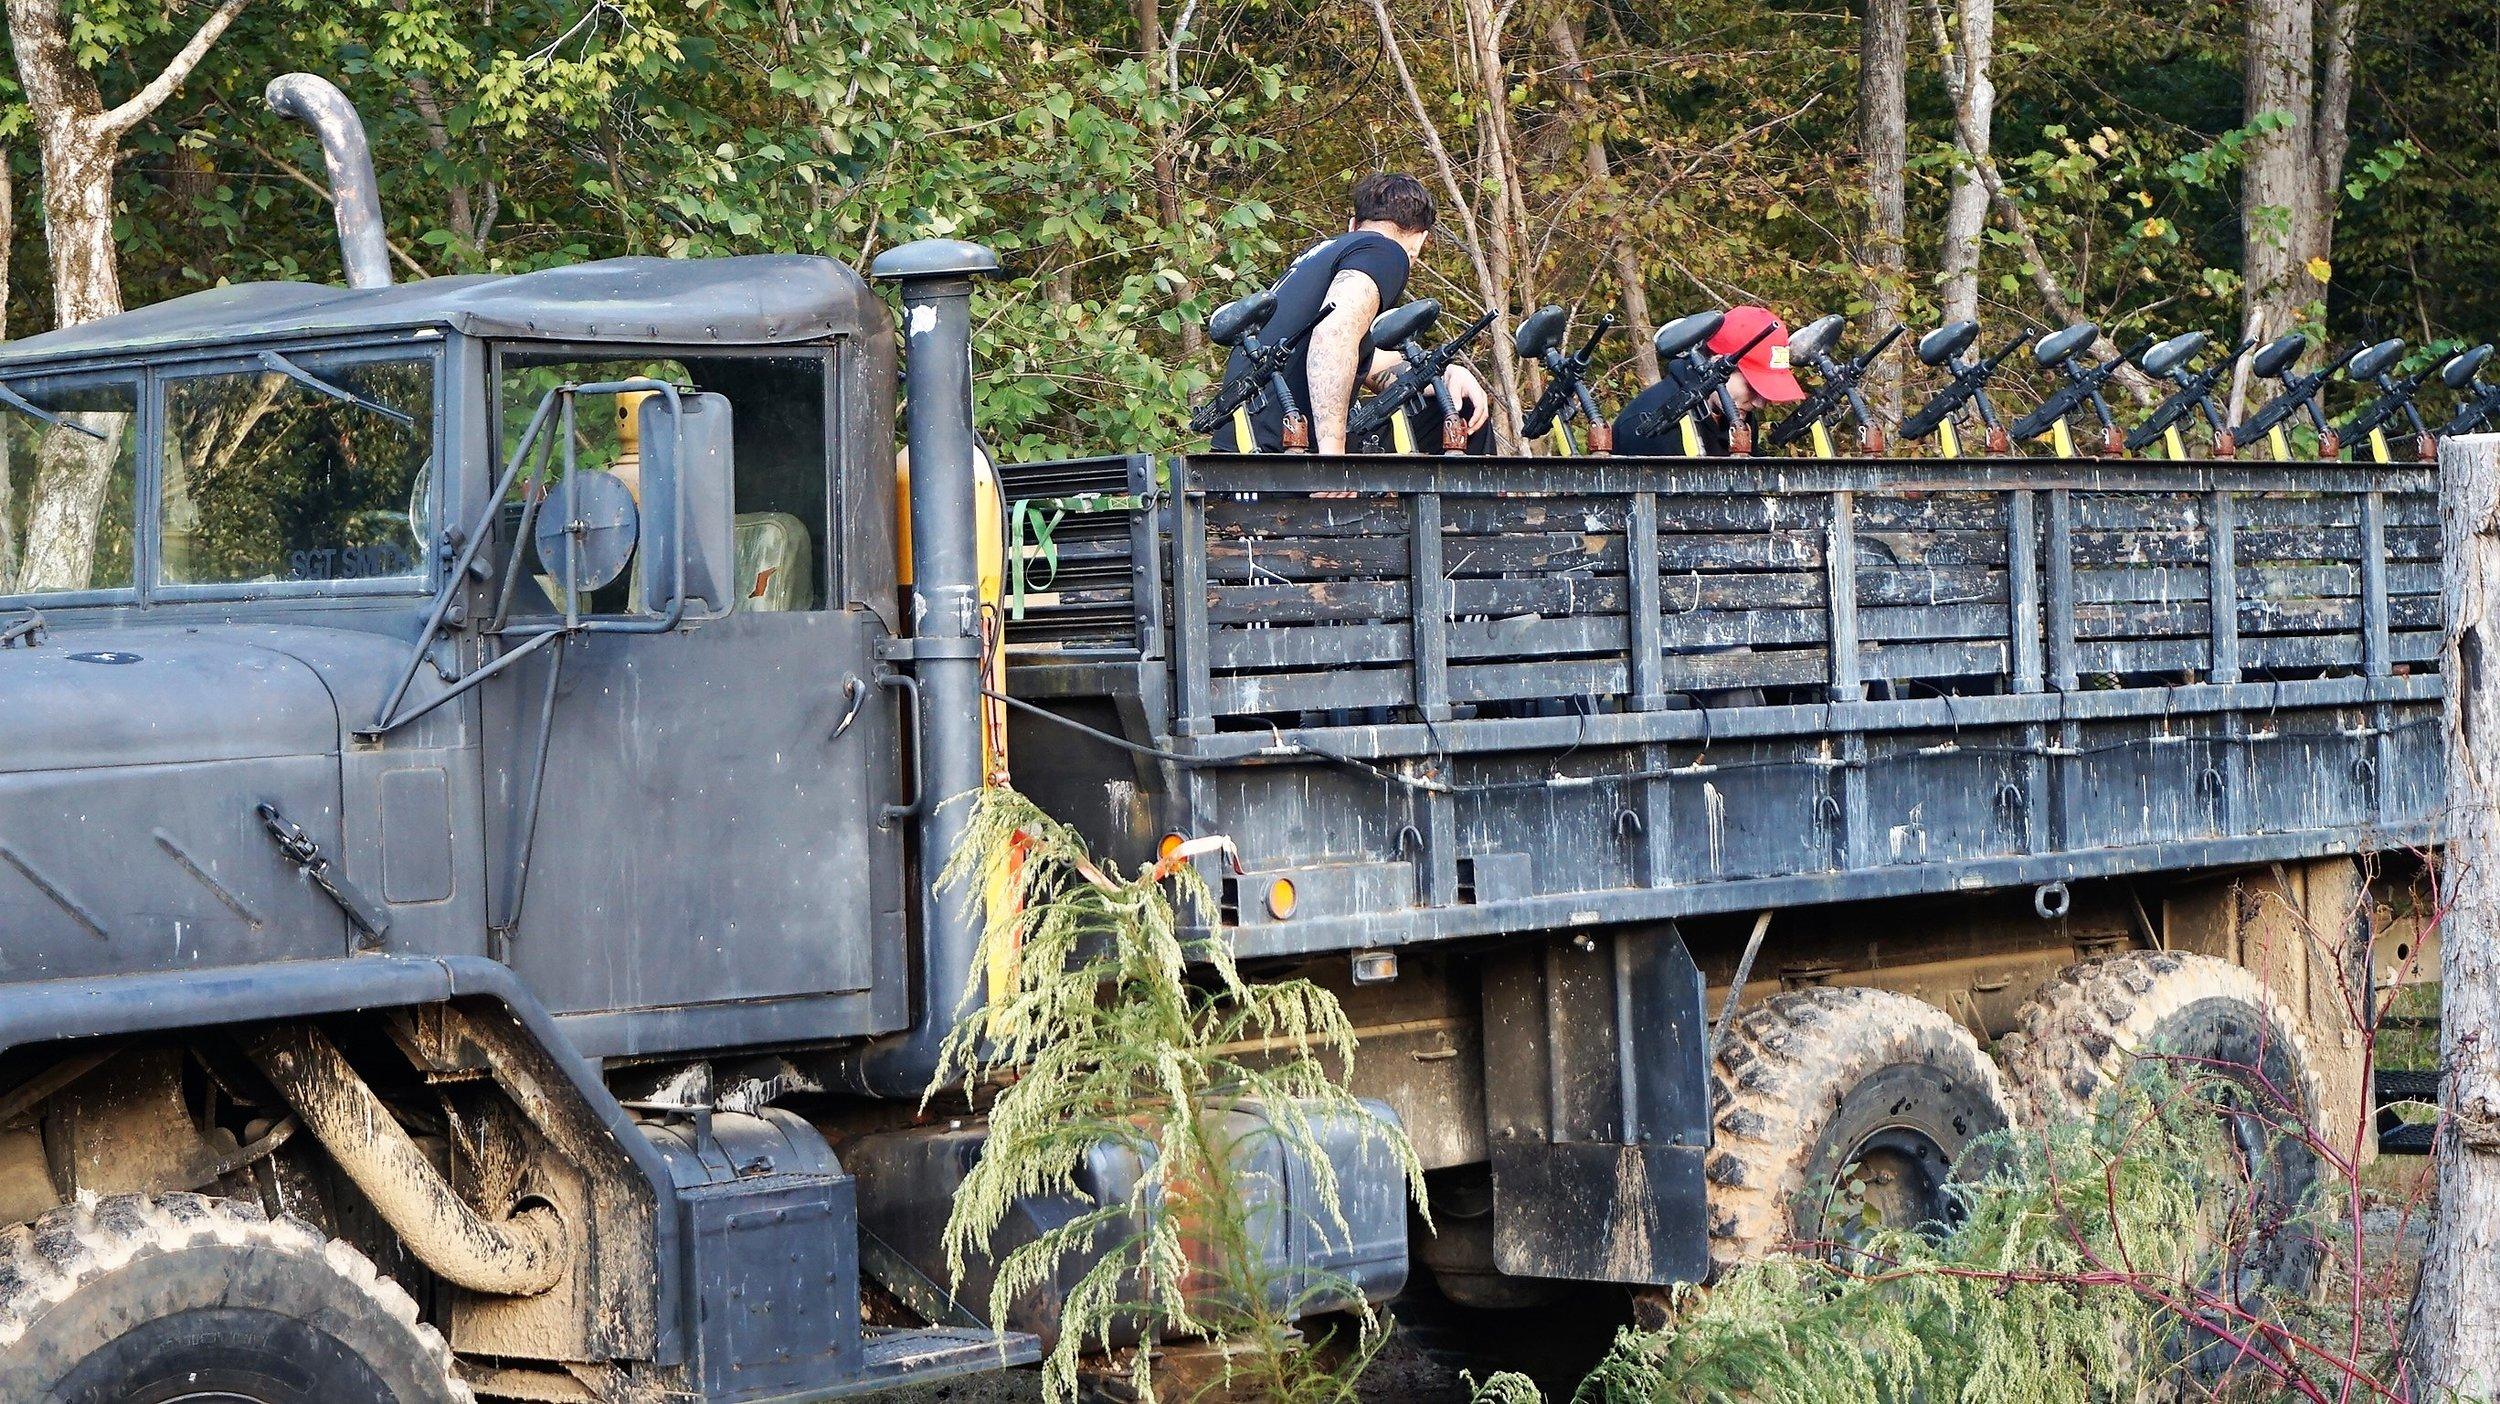 Xtreme Haunt military trucks